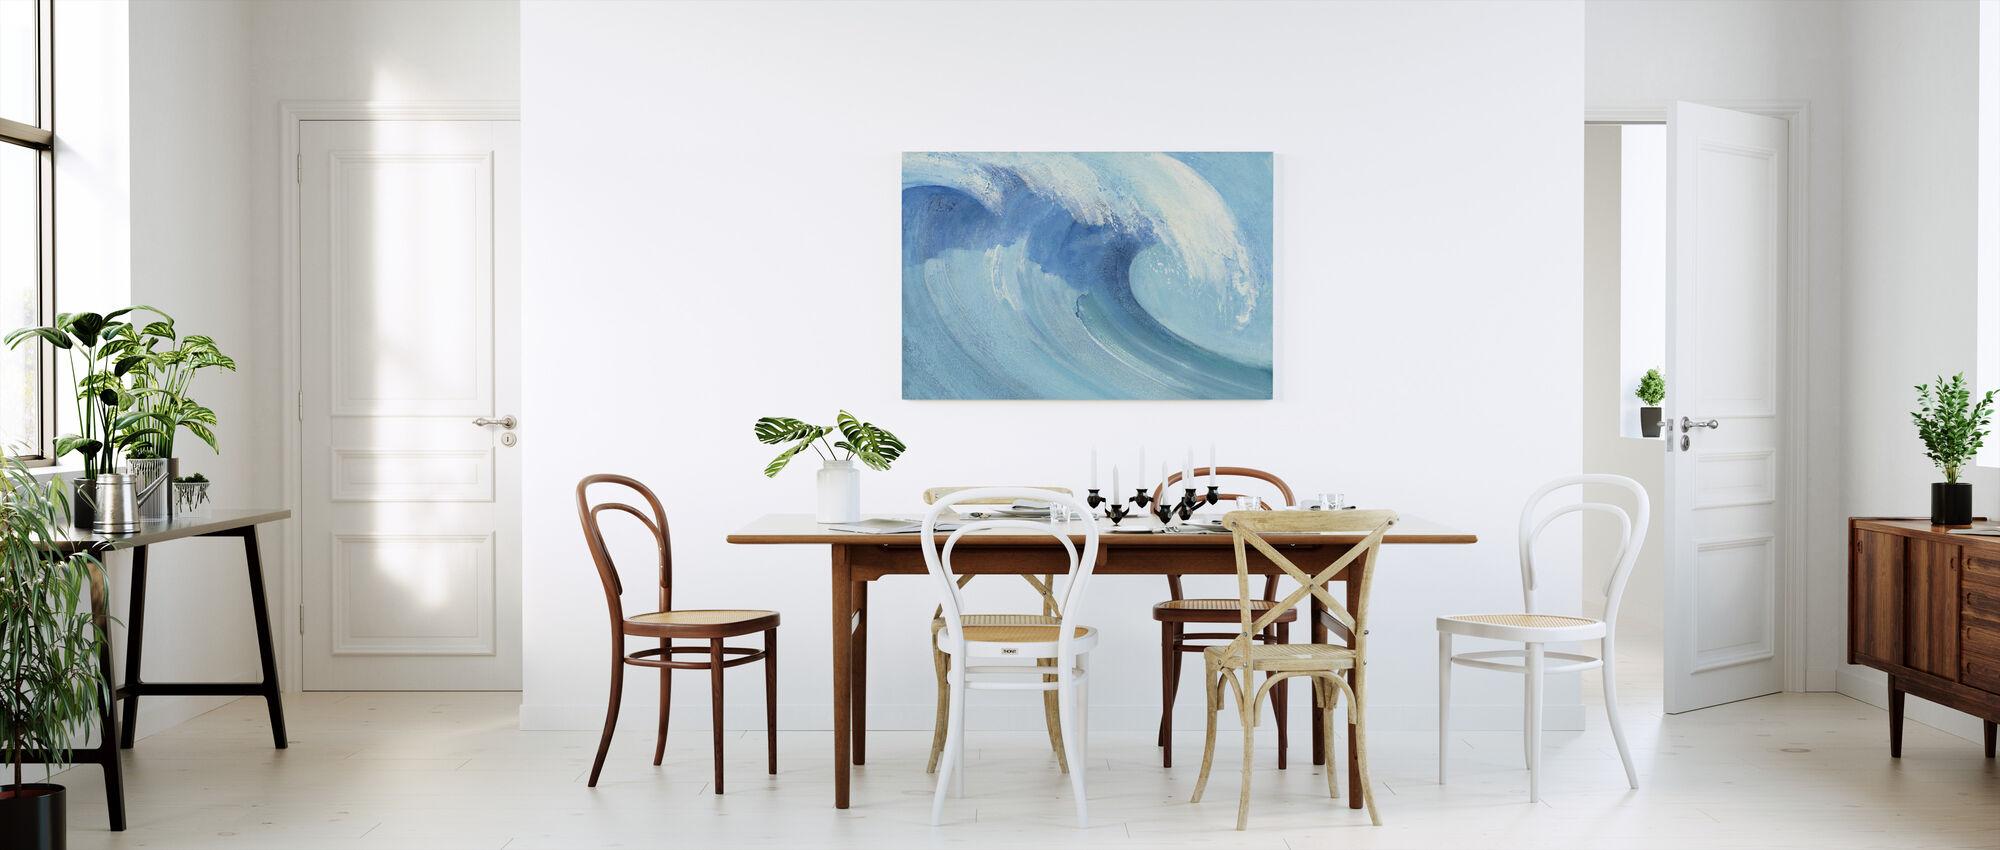 Catch a Wave - Canvas print - Kitchen